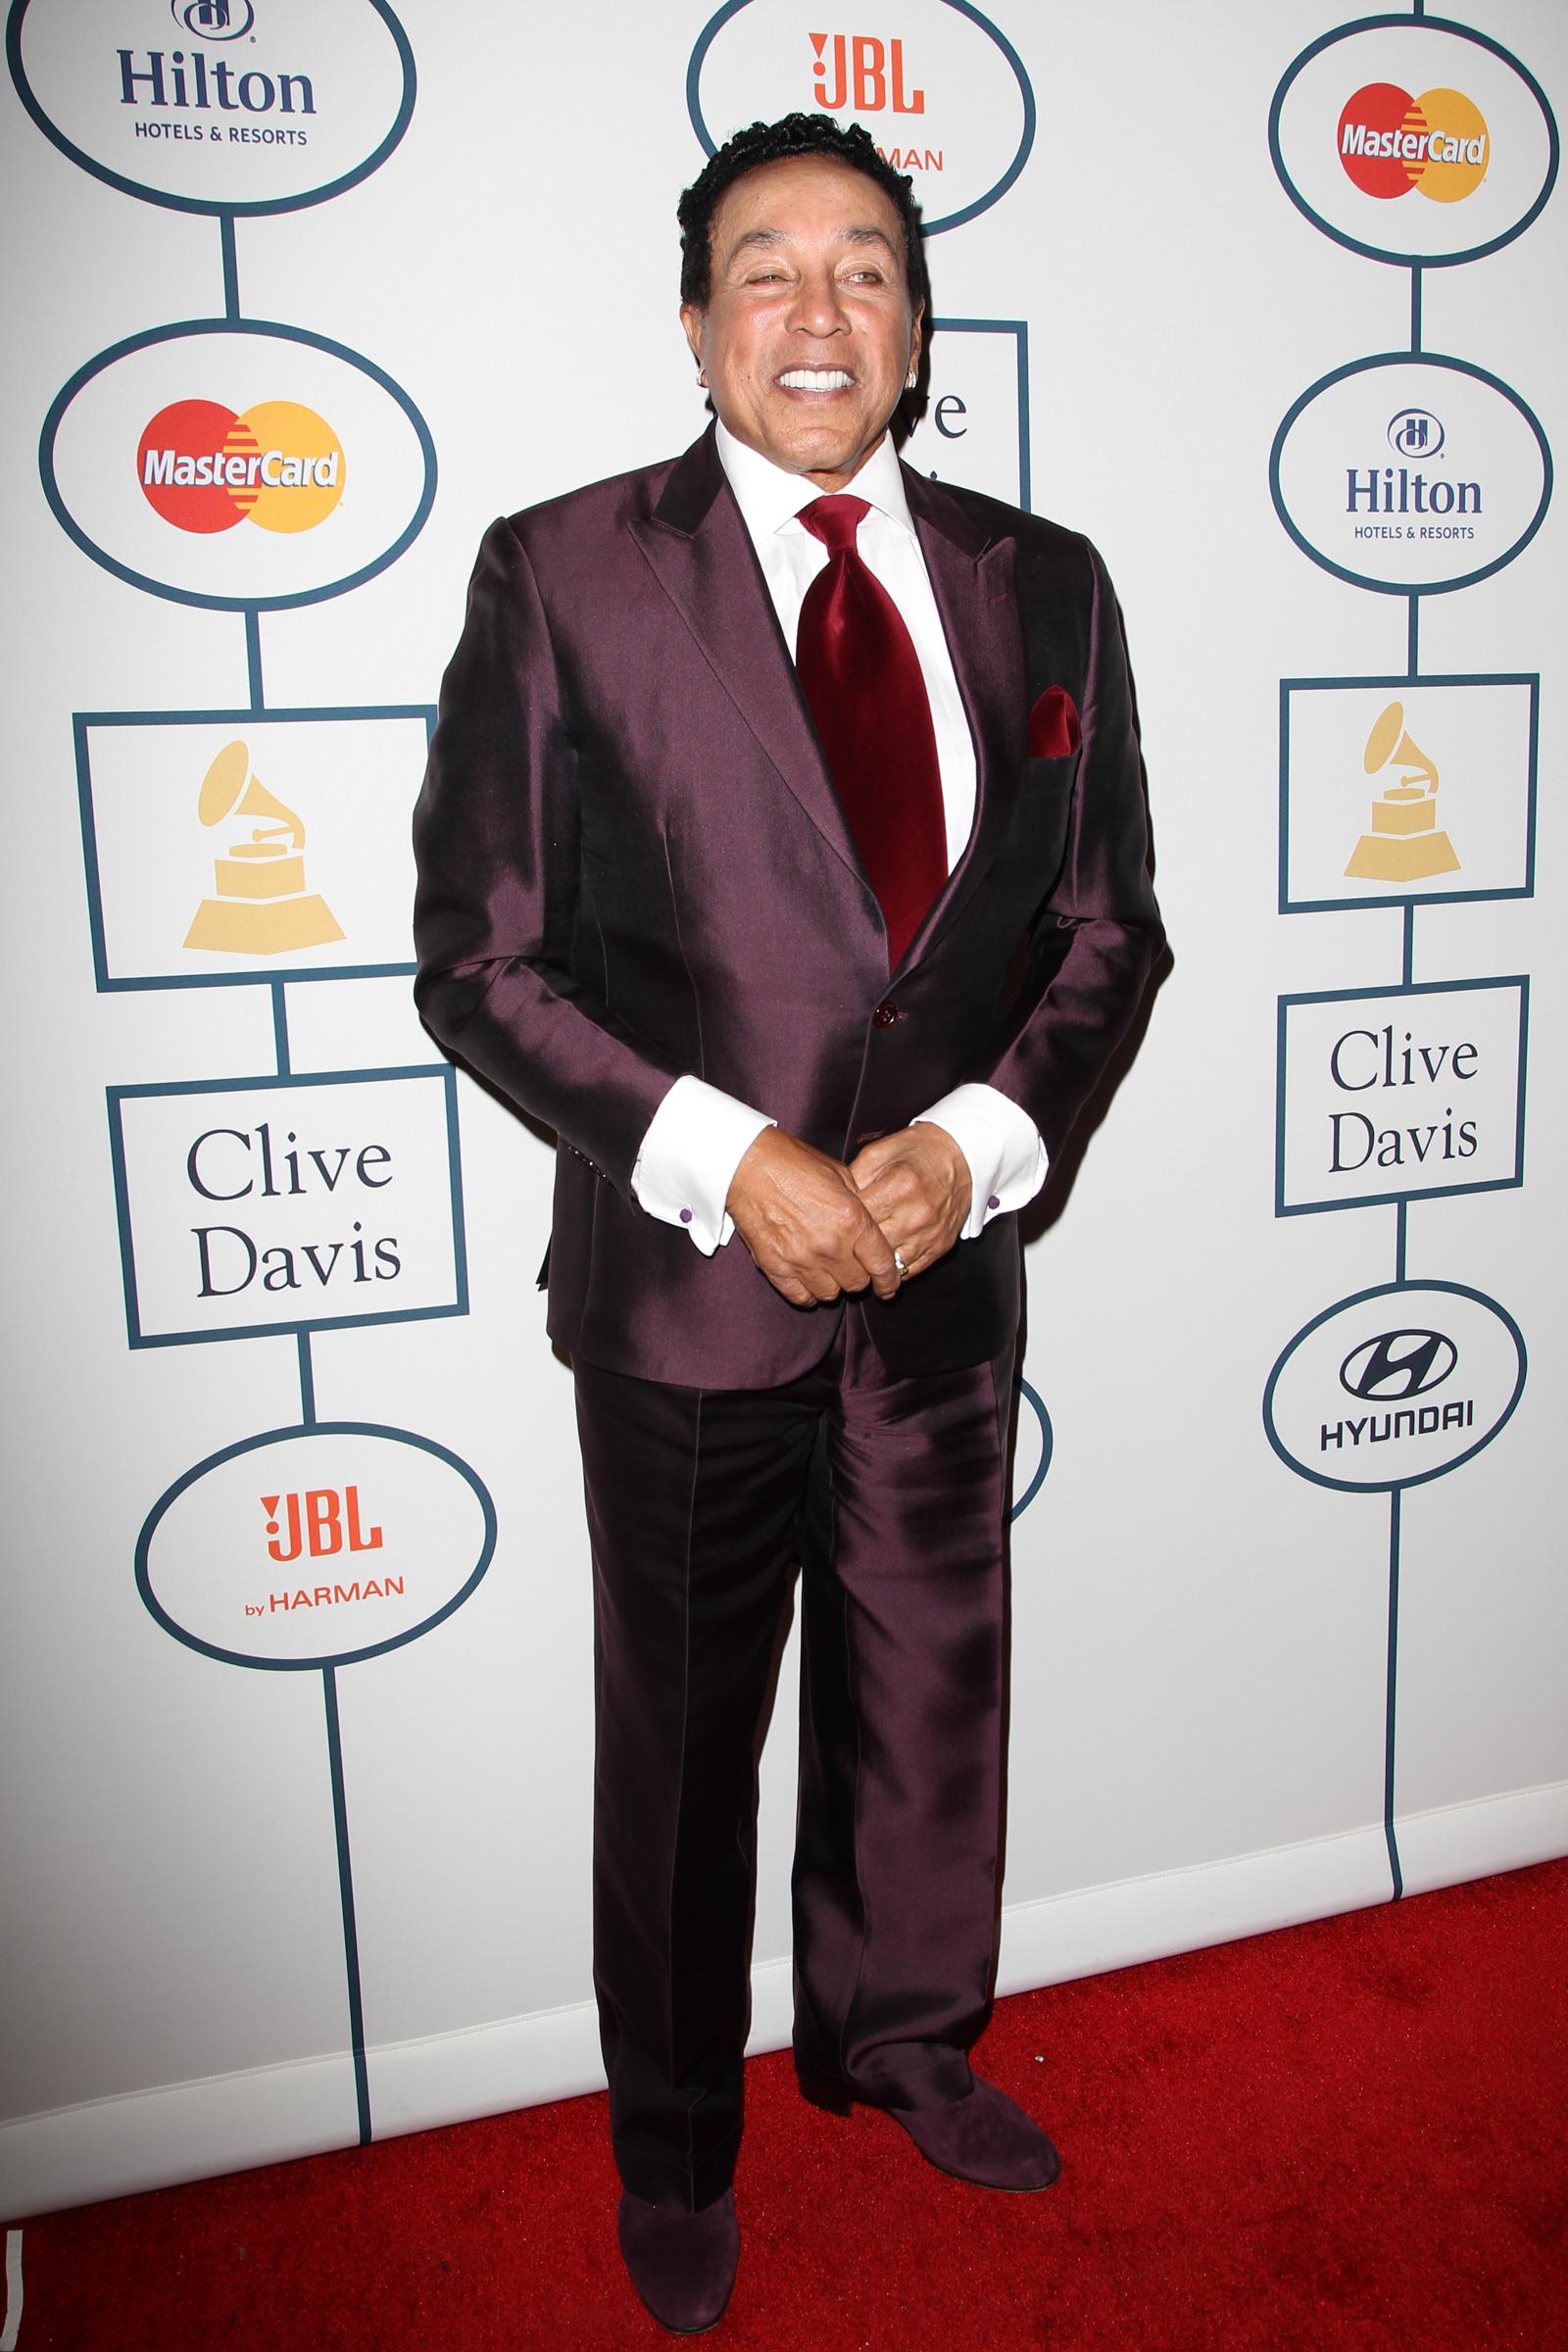 Smokey Robinson Clive Davis Grammy party